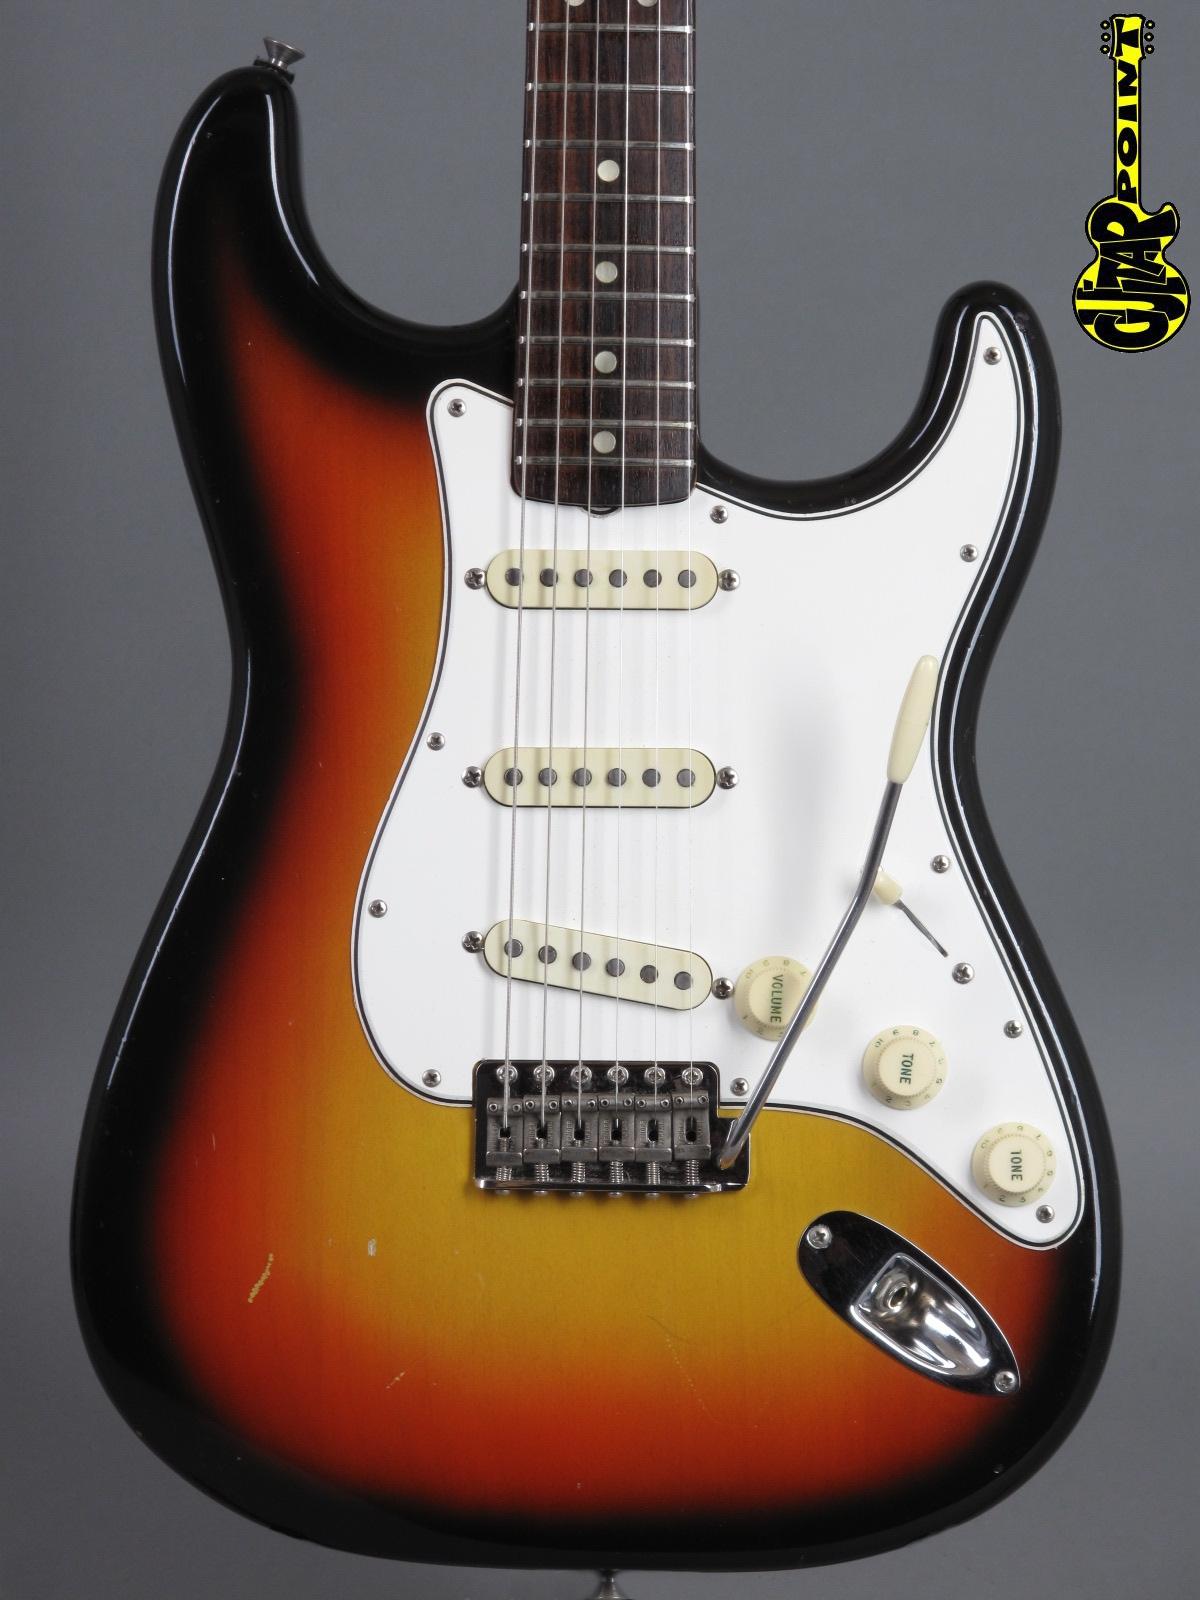 1966 Fender Stratocaster - 3t-Sunburst   ..neckdate Dec 65 !